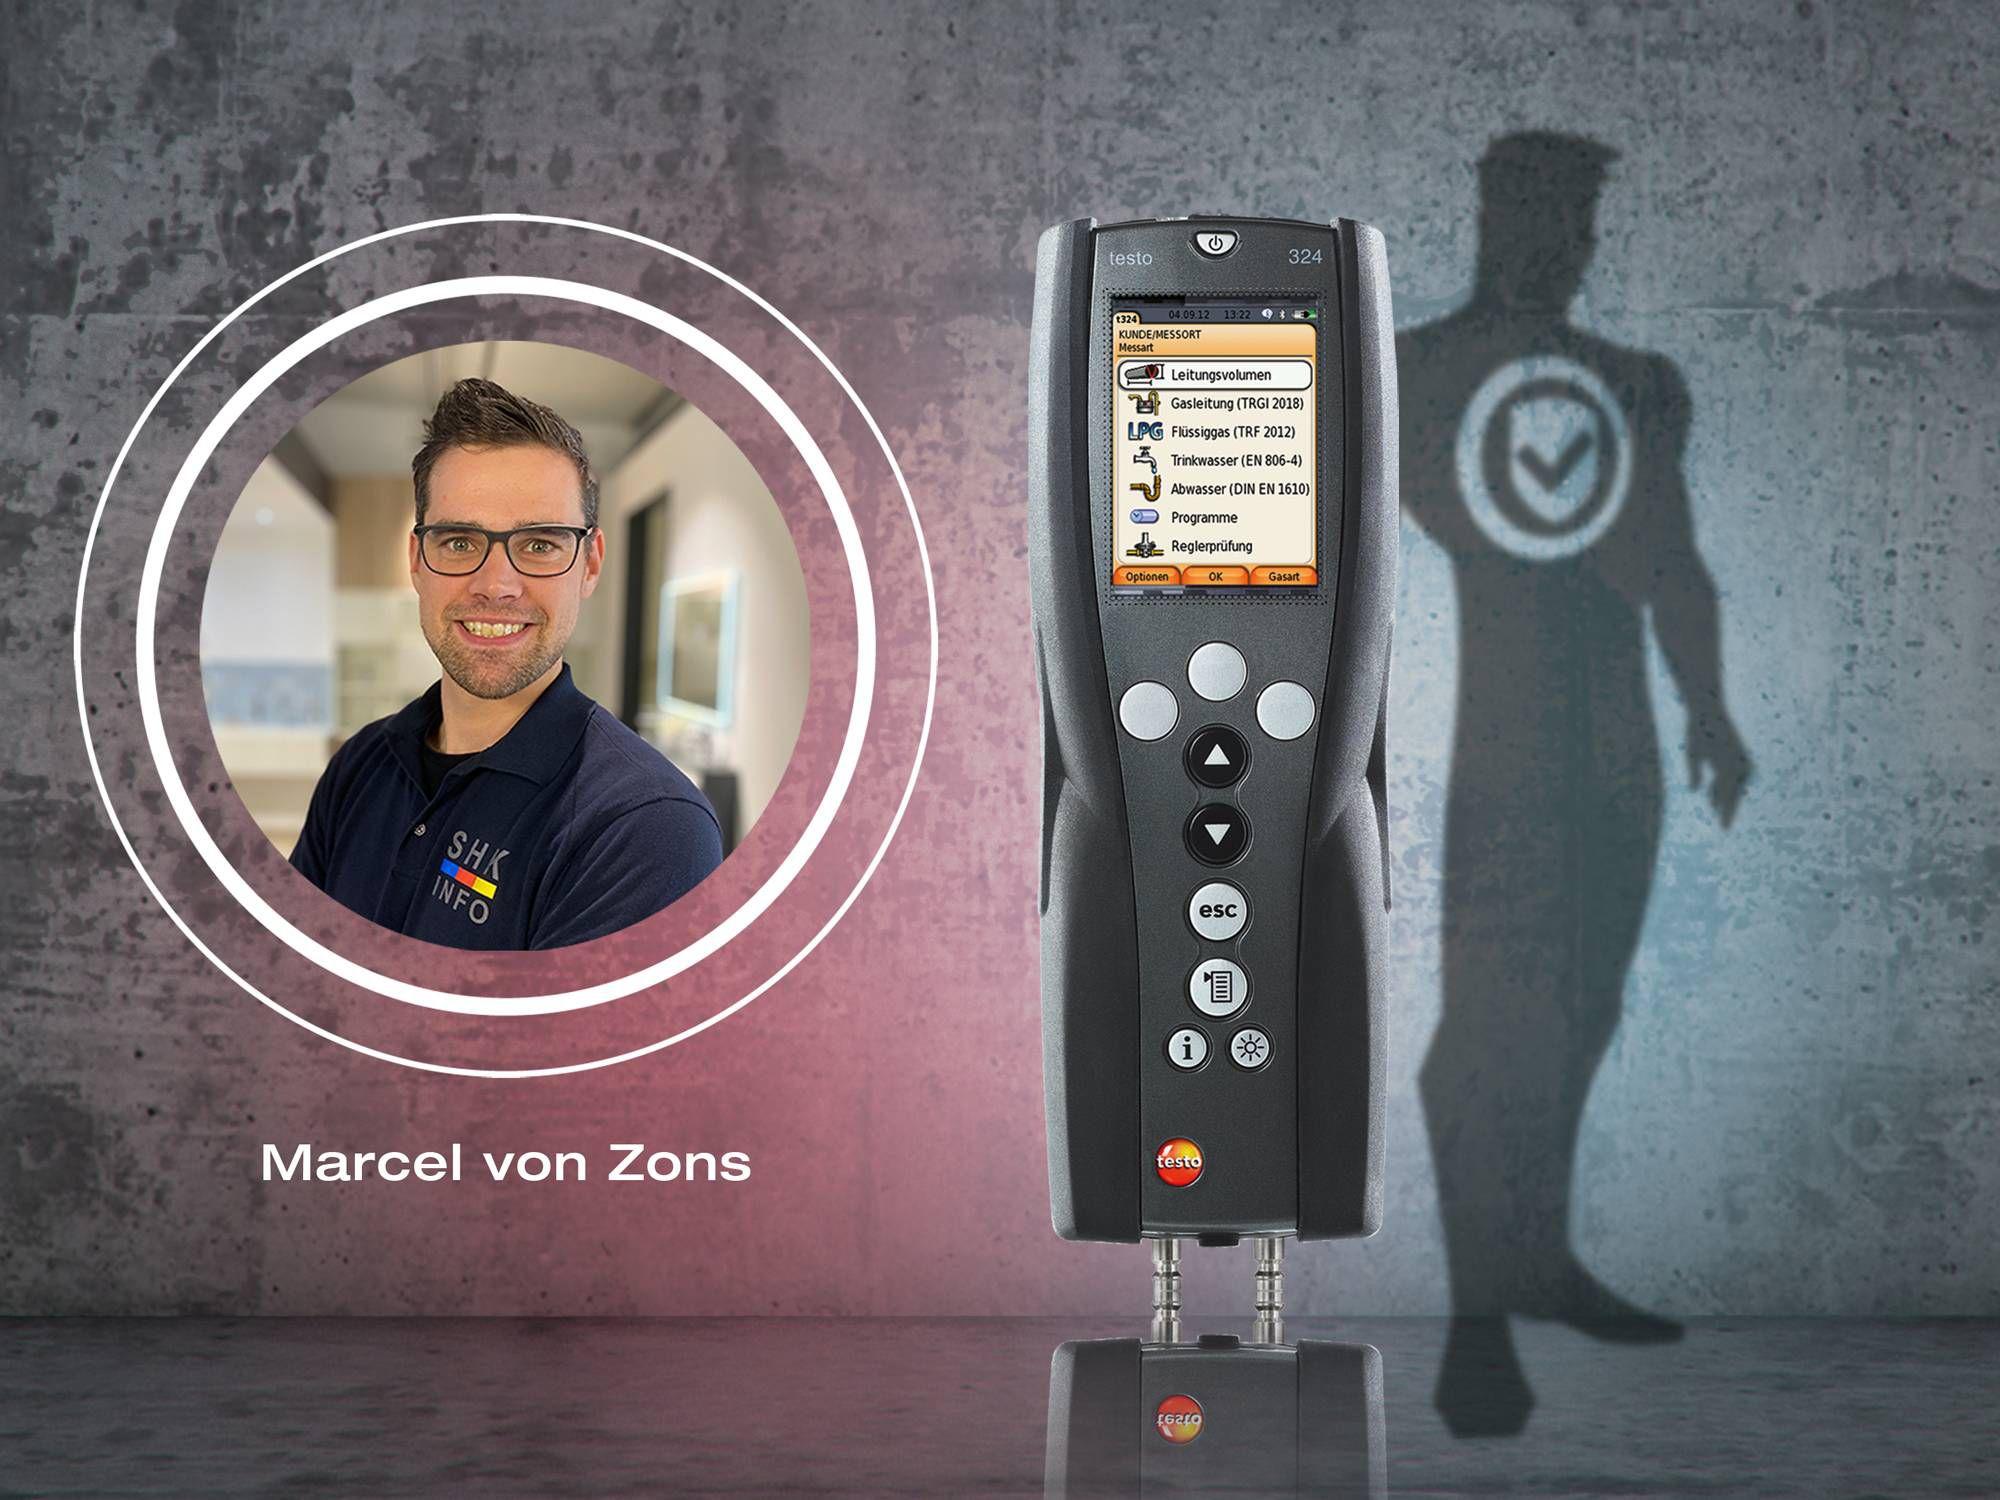 i-hv-sp-heating-2021-m-herbstaktion-t324-marcel-von-zons-service-talk.jpg